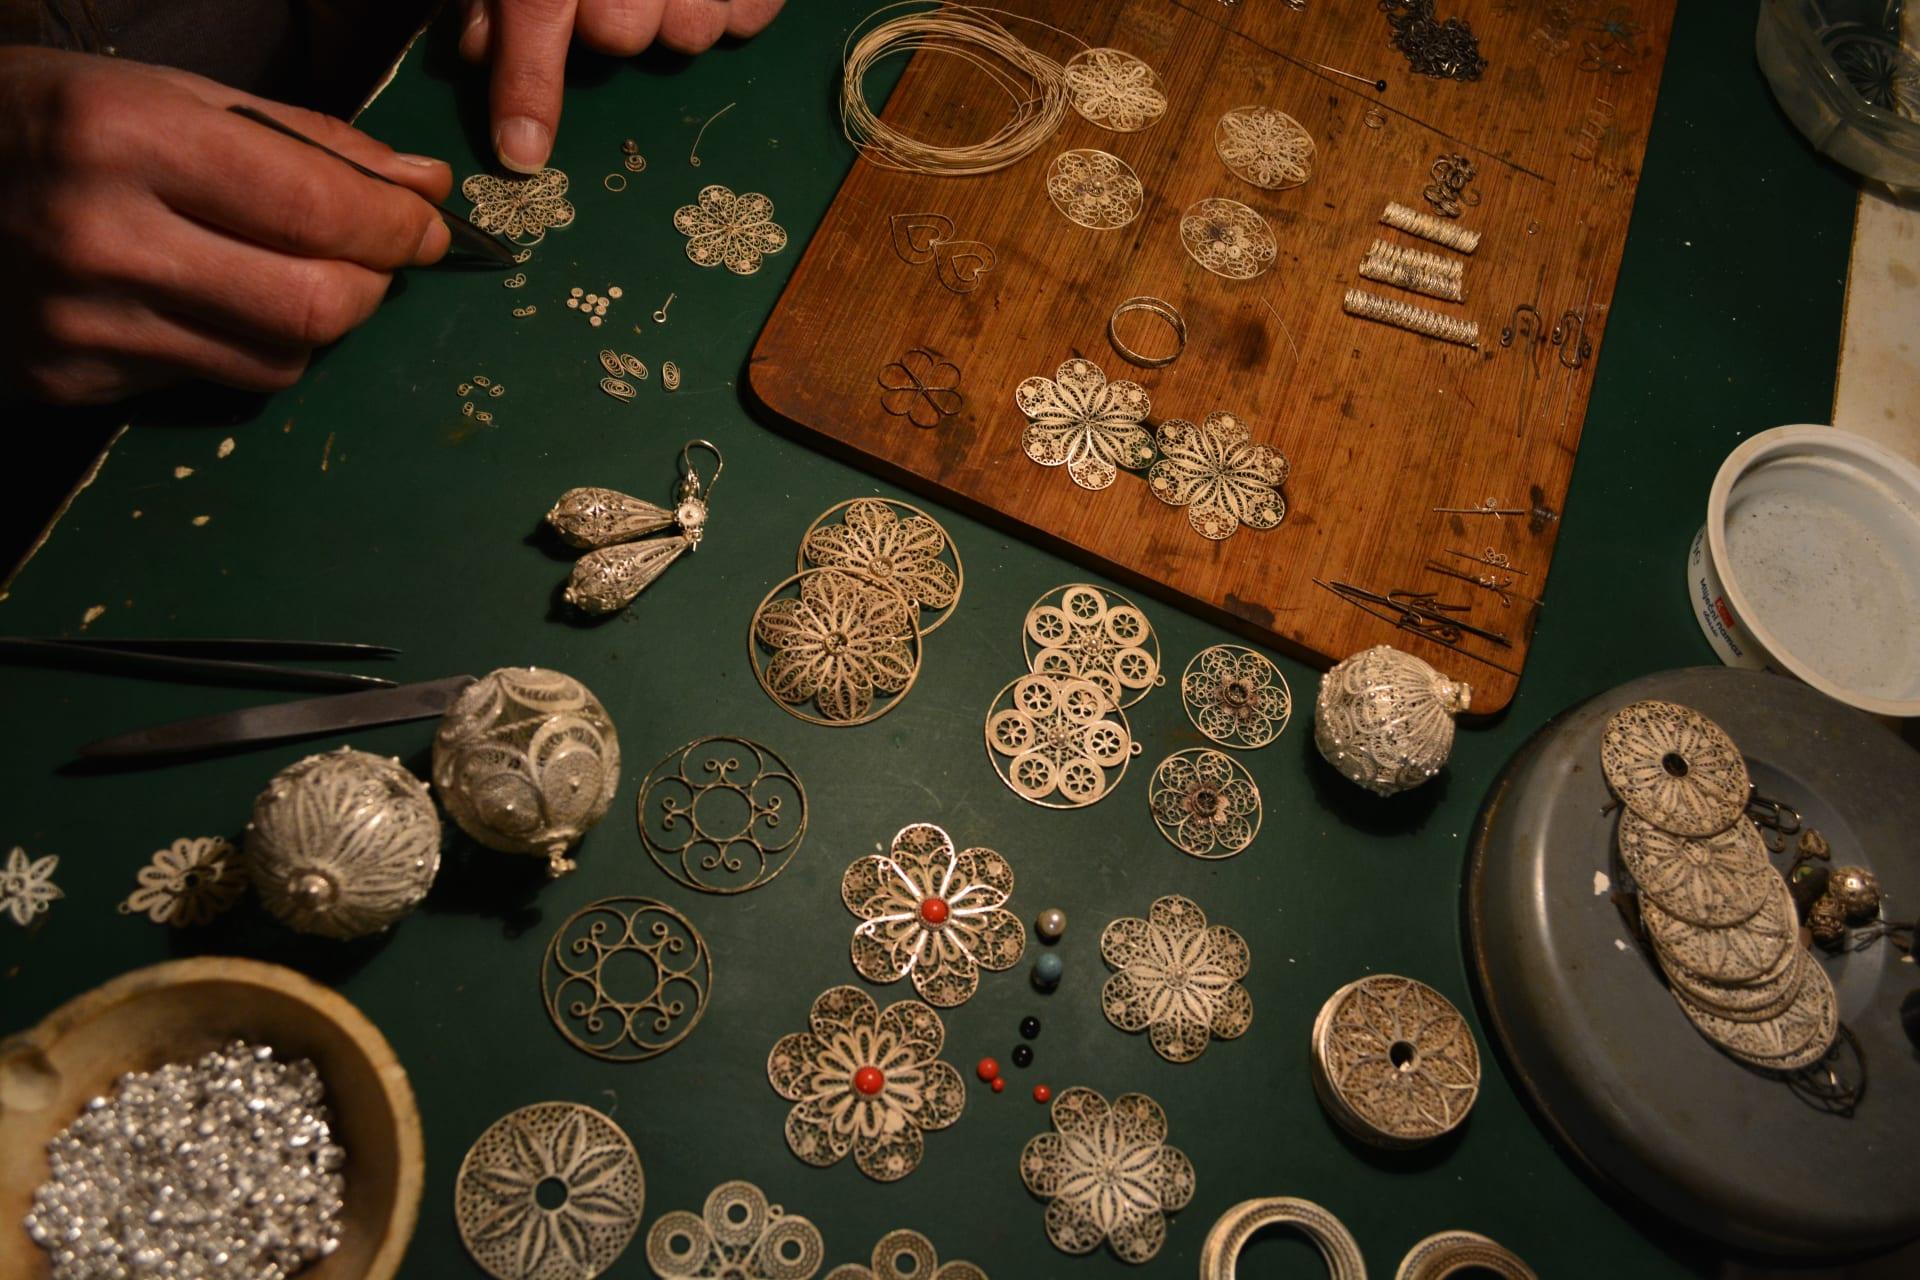 Korcula - The Art of Traditional Filigree Jewellery - Botuni